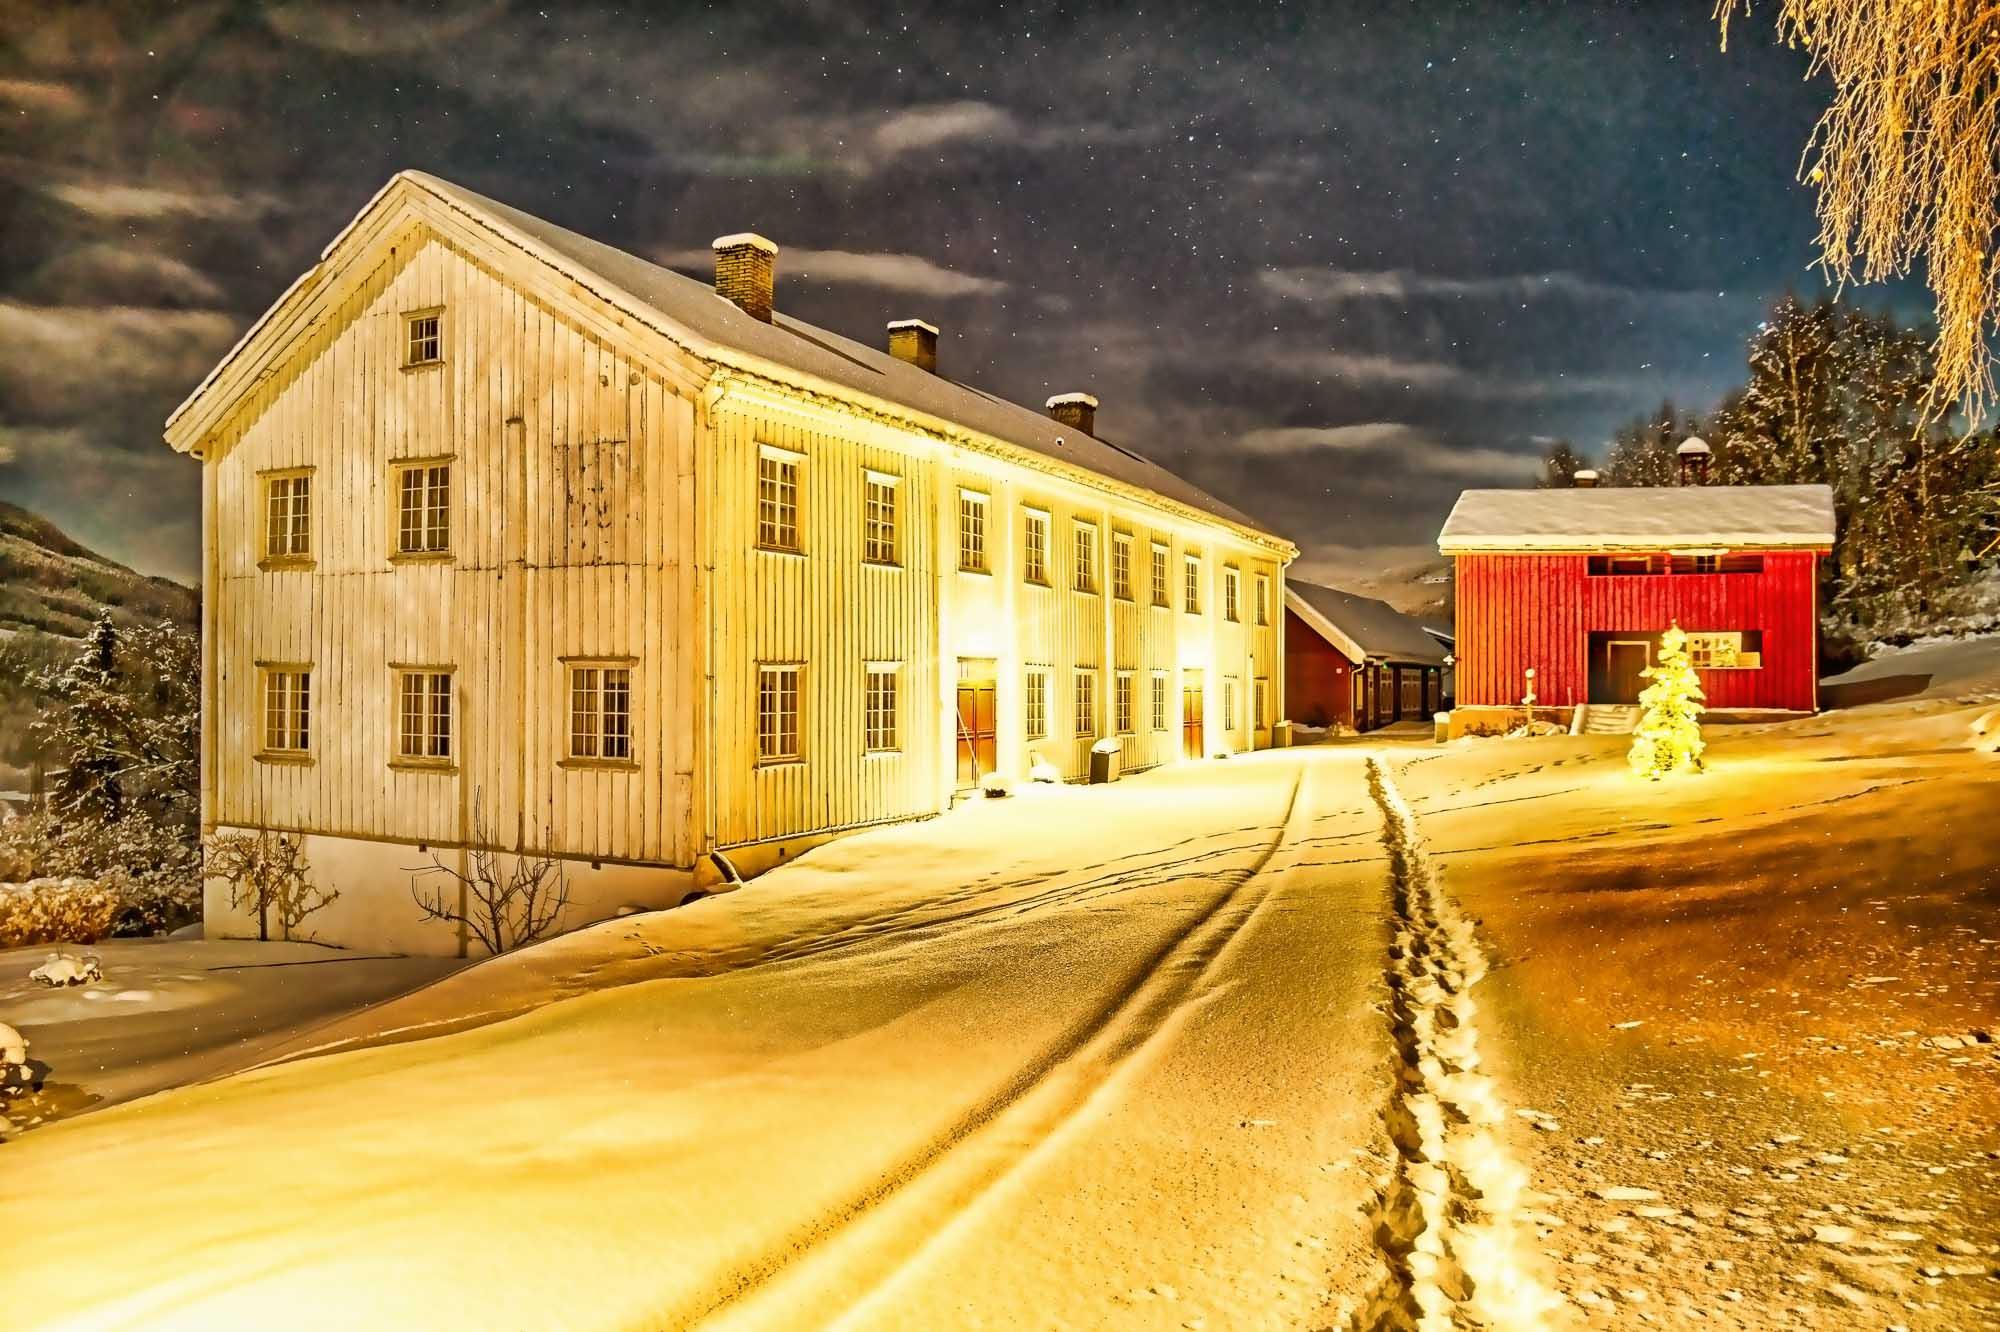 Julekortstemning ved Ringebu Prestegård 2015. Ha en fin førjulstid og en god jul:-)